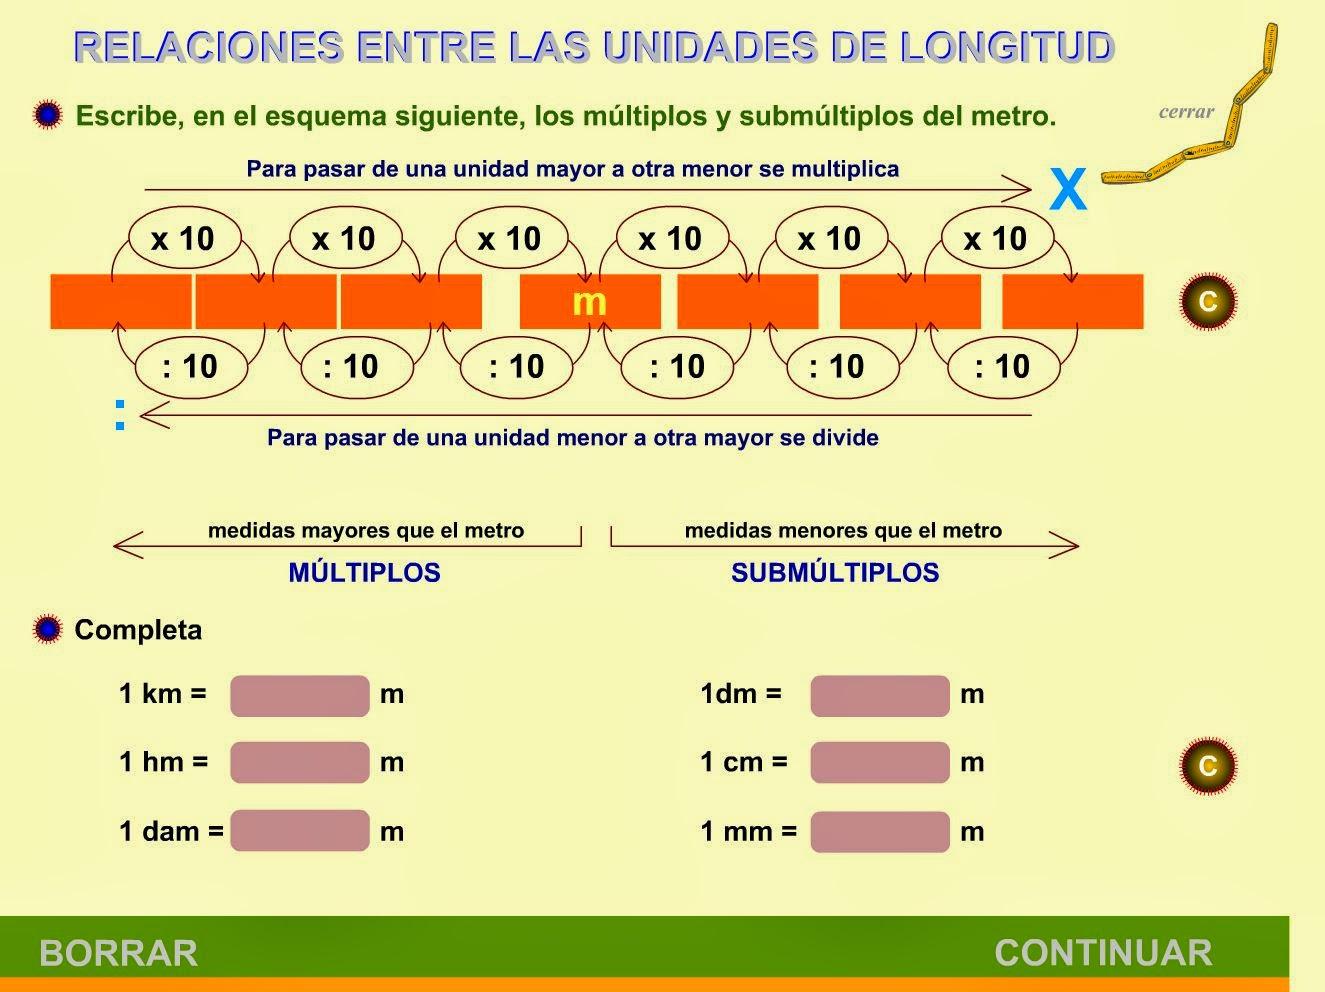 http://www.gobiernodecanarias.org/educacion/3/WebC/eltanque/todo_mate/r_medidas/e_metro/longitud_ep.html